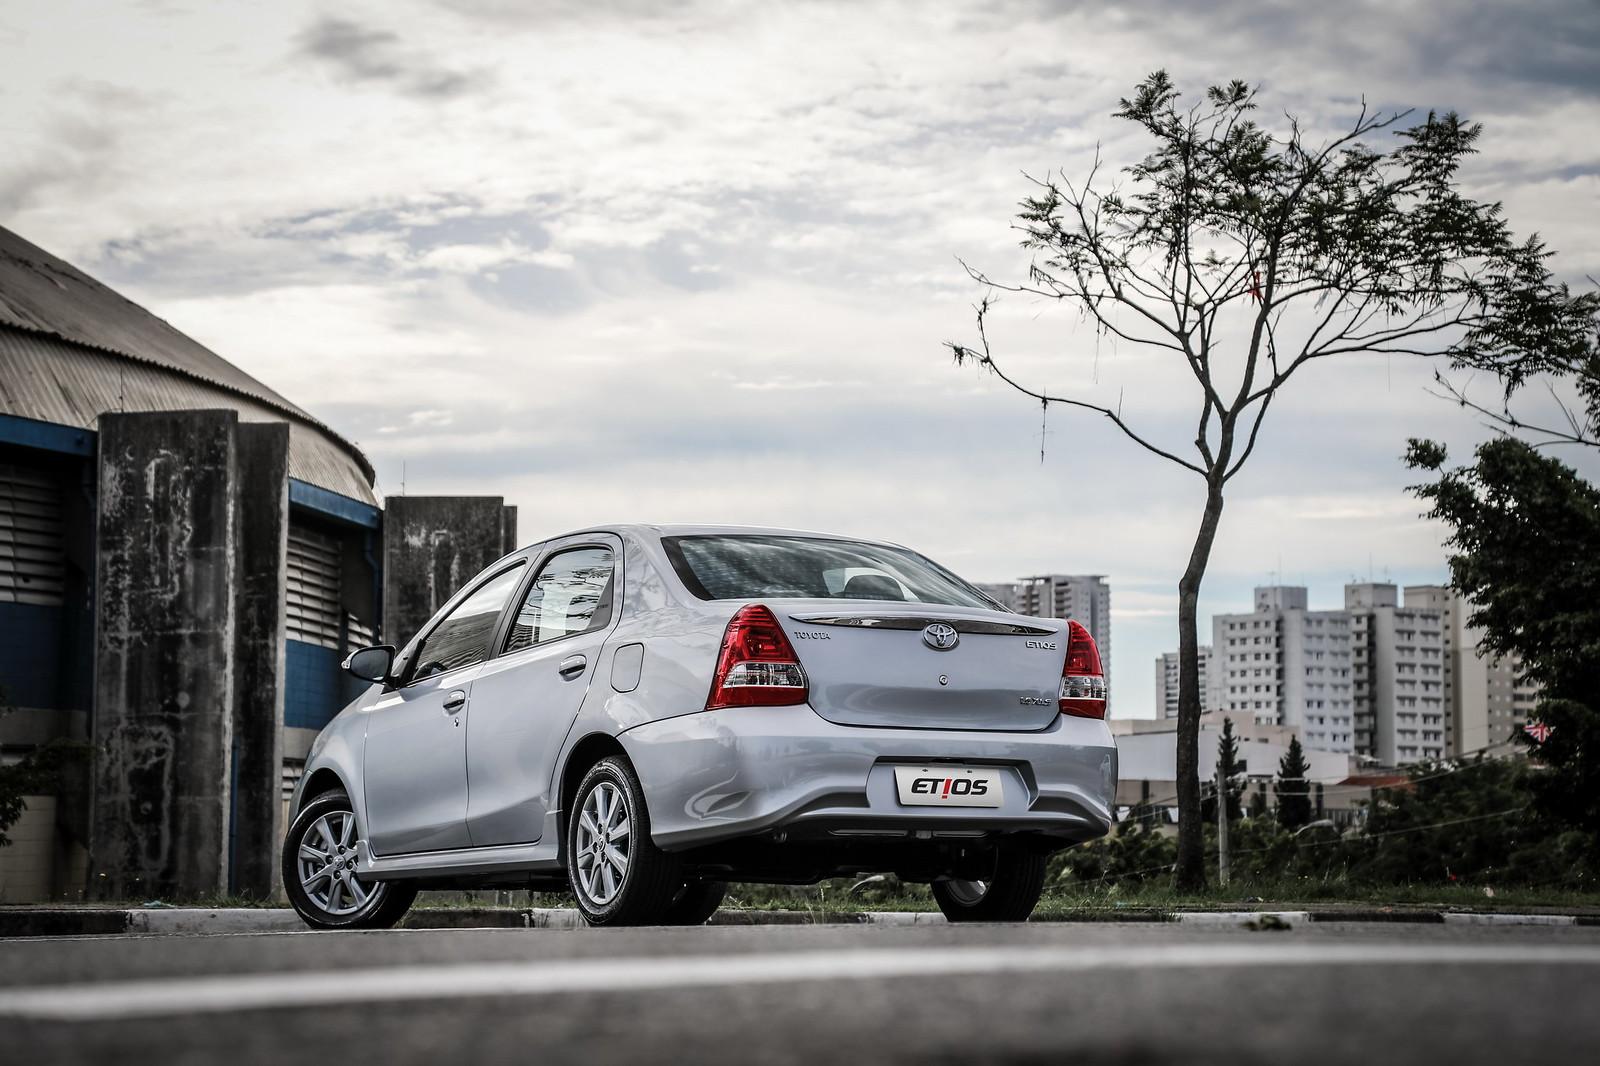 Carsdrive Cordoba Autos Que Menos Consumen I Entrada De Gama Up